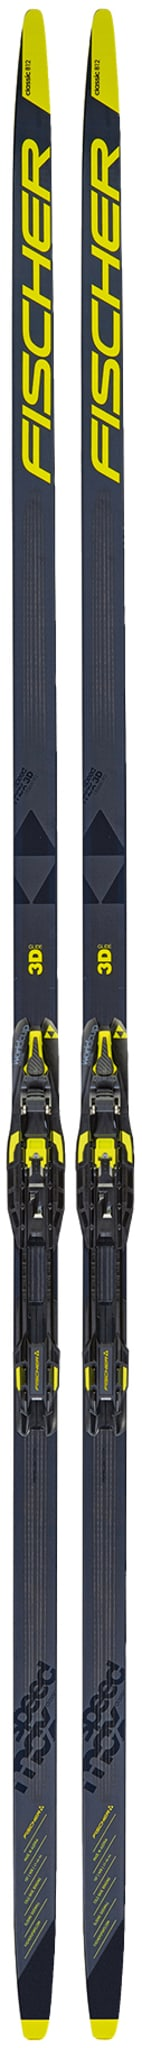 Allround klassisk ski i verdensklasse!